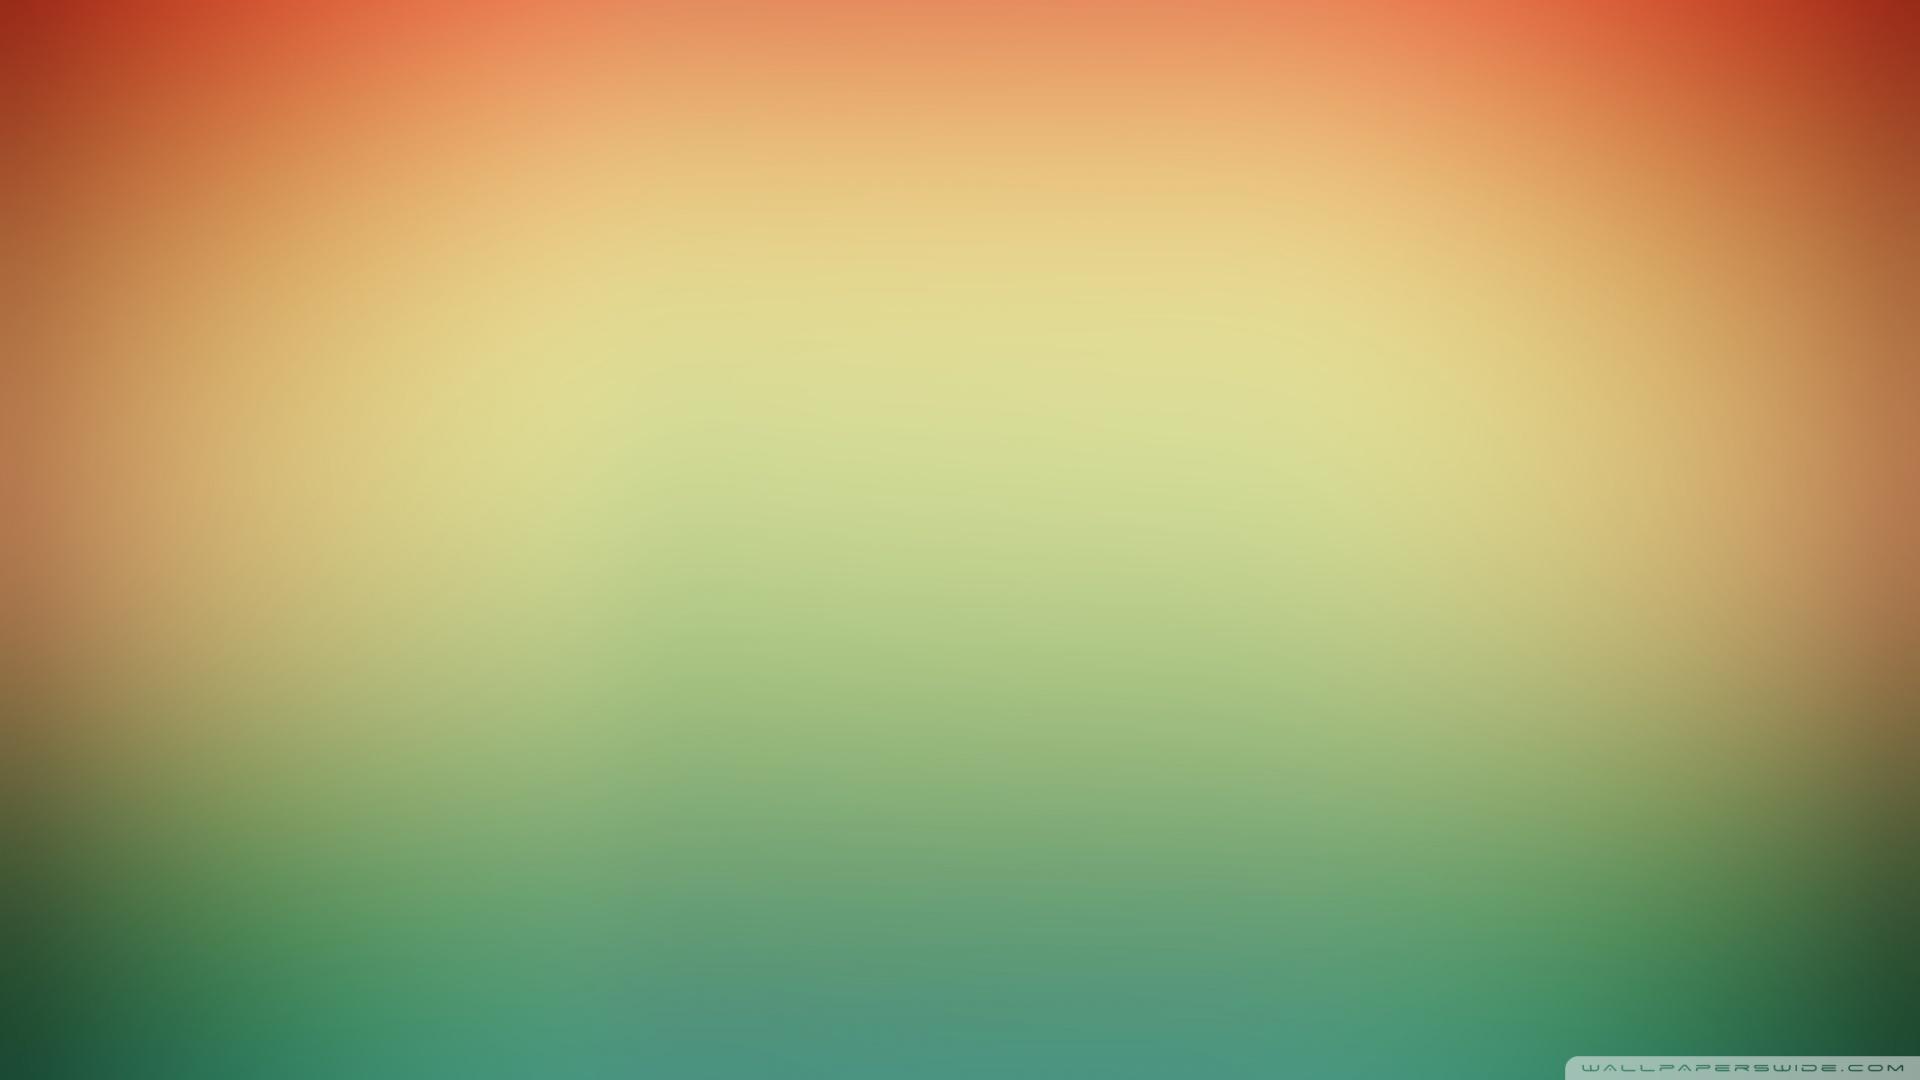 Download Vintage Retro Colors Cute Best Wallpaper 1920x1080 Full HD 1920x1080